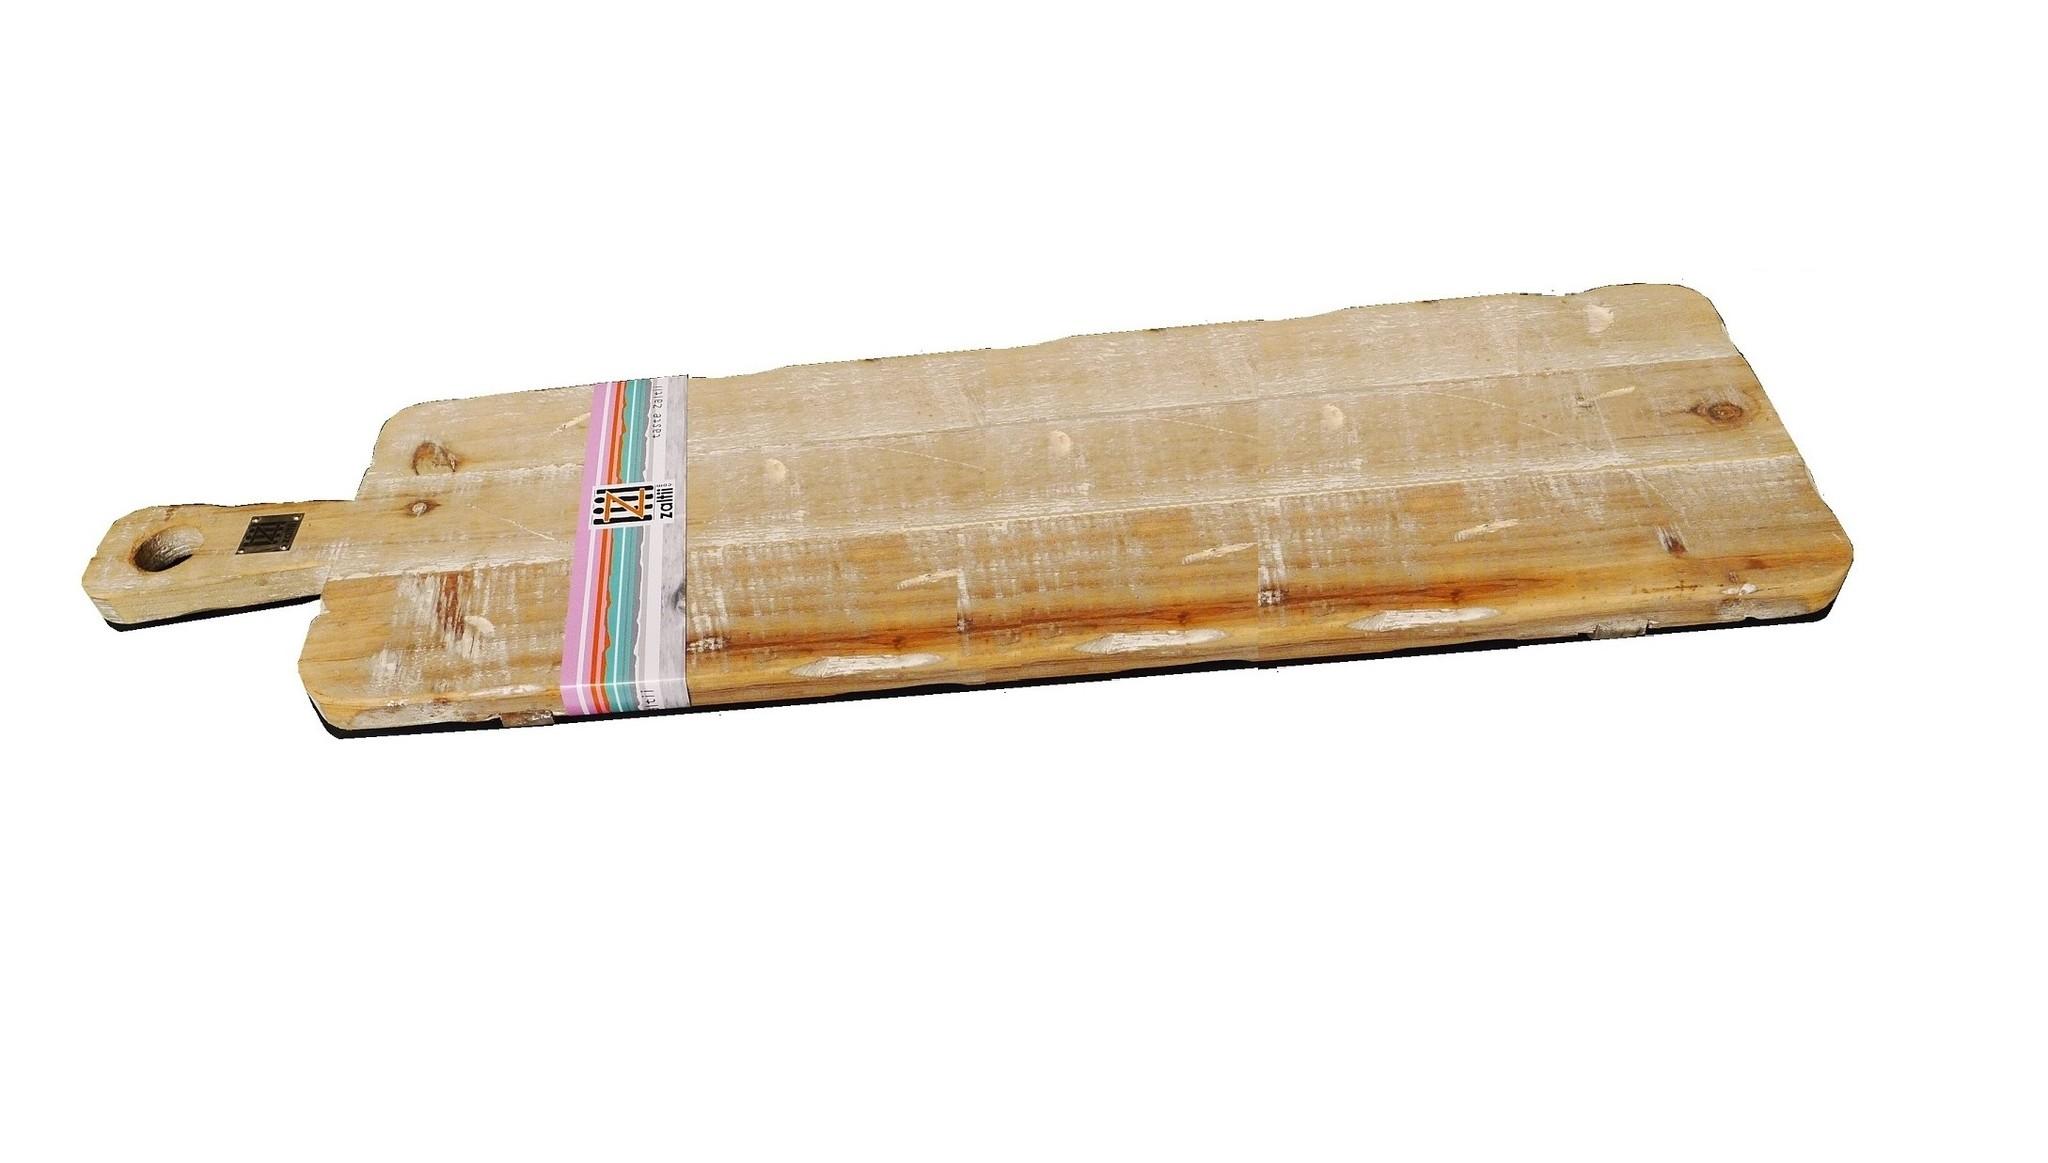 trayold dutchcutting blade 66/20-1